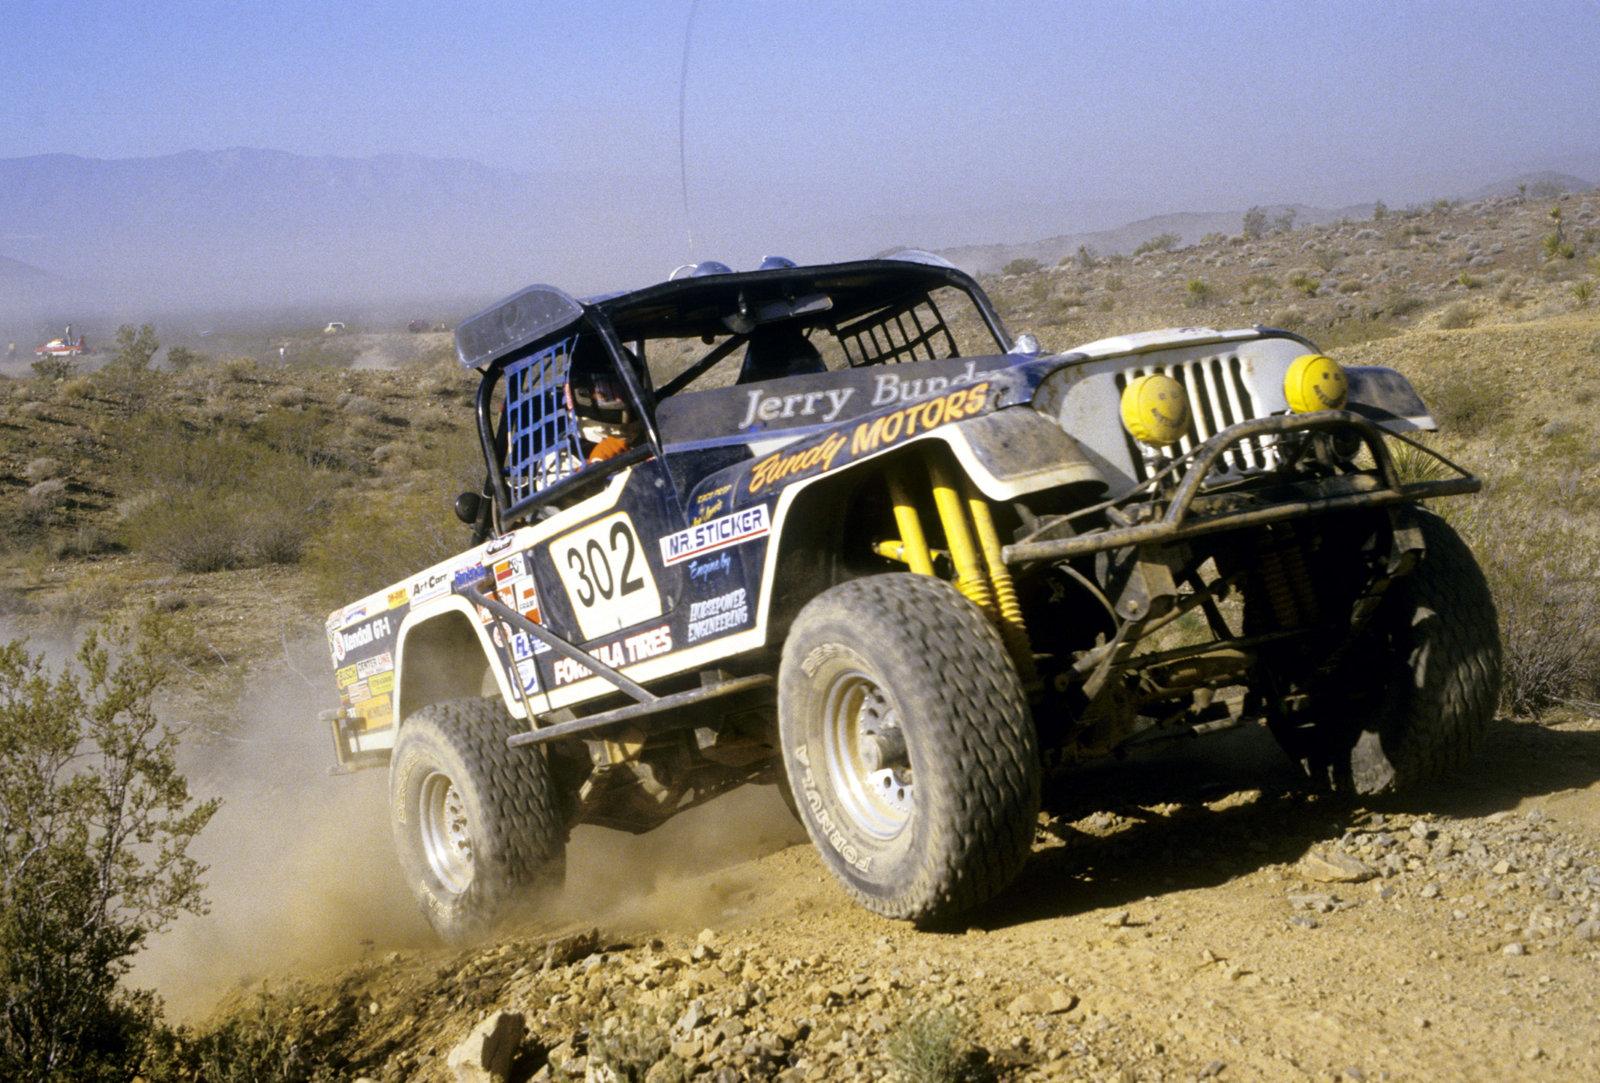 Centerline Images.1988.Mojave.Bundy.21x.jpg